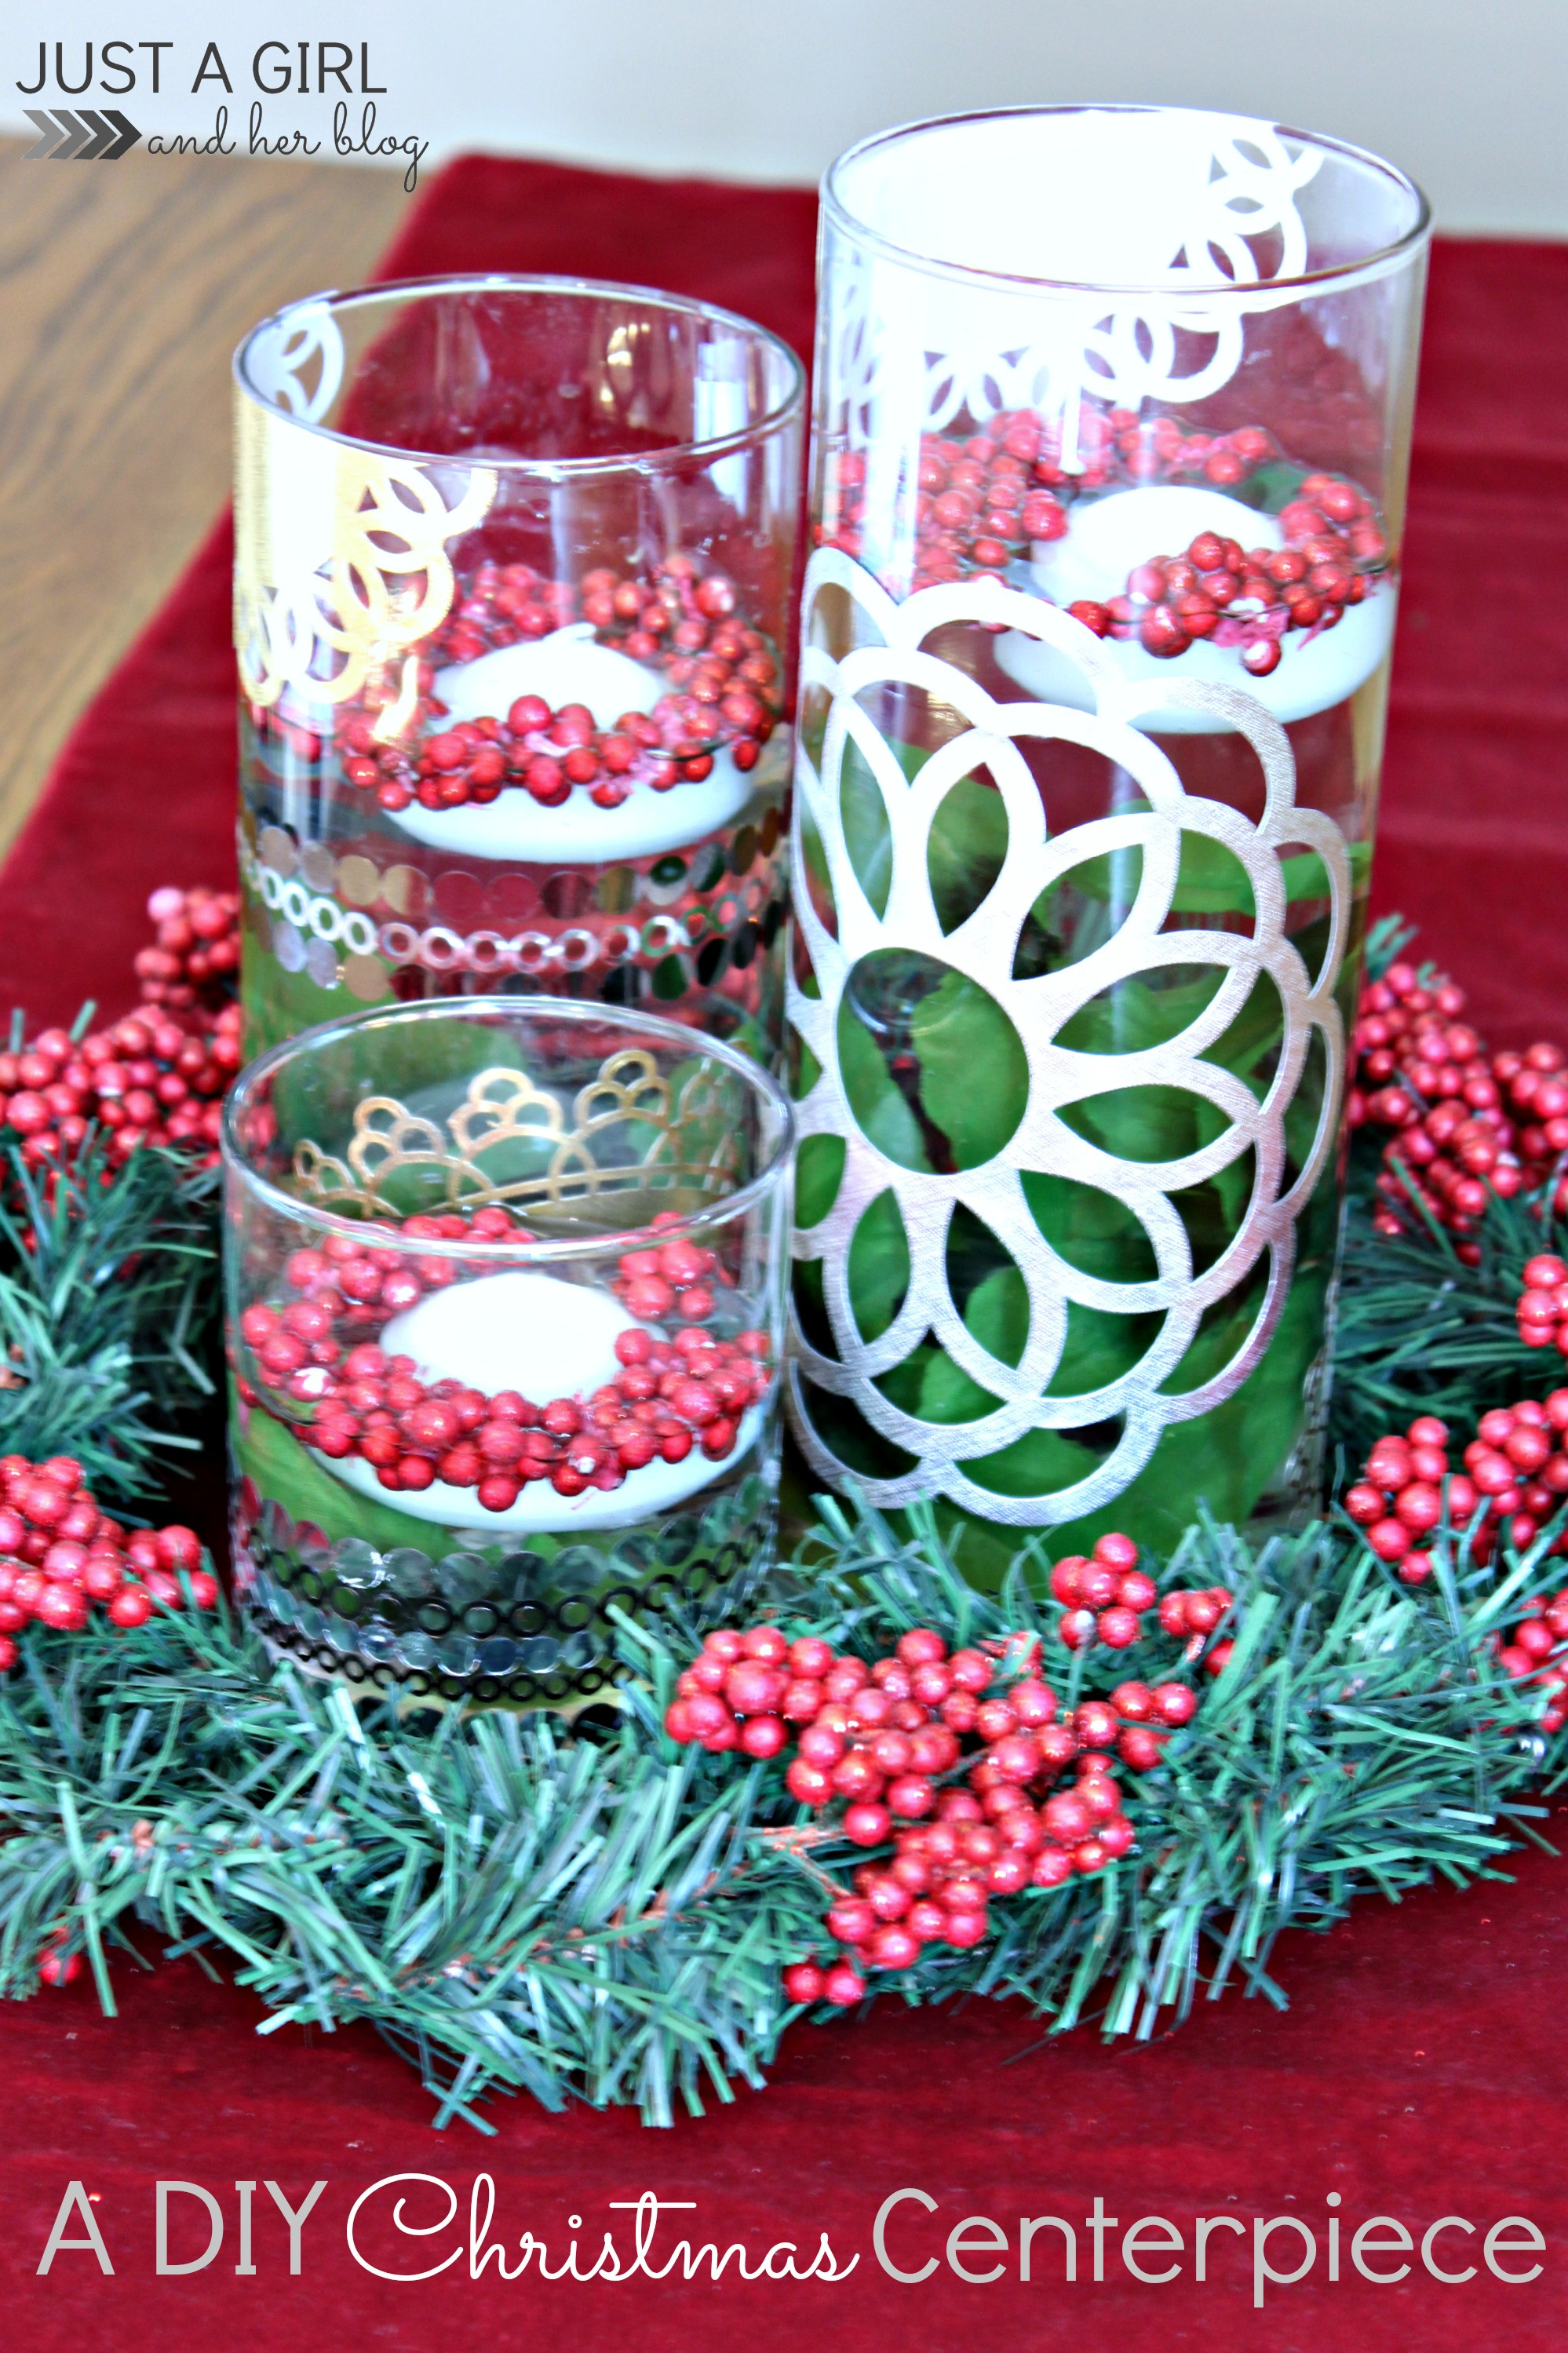 Best ideas about DIY Christmas Centerpieces . Save or Pin A DIY Christmas Centerpiece with Martha Stewart Crafts Now.